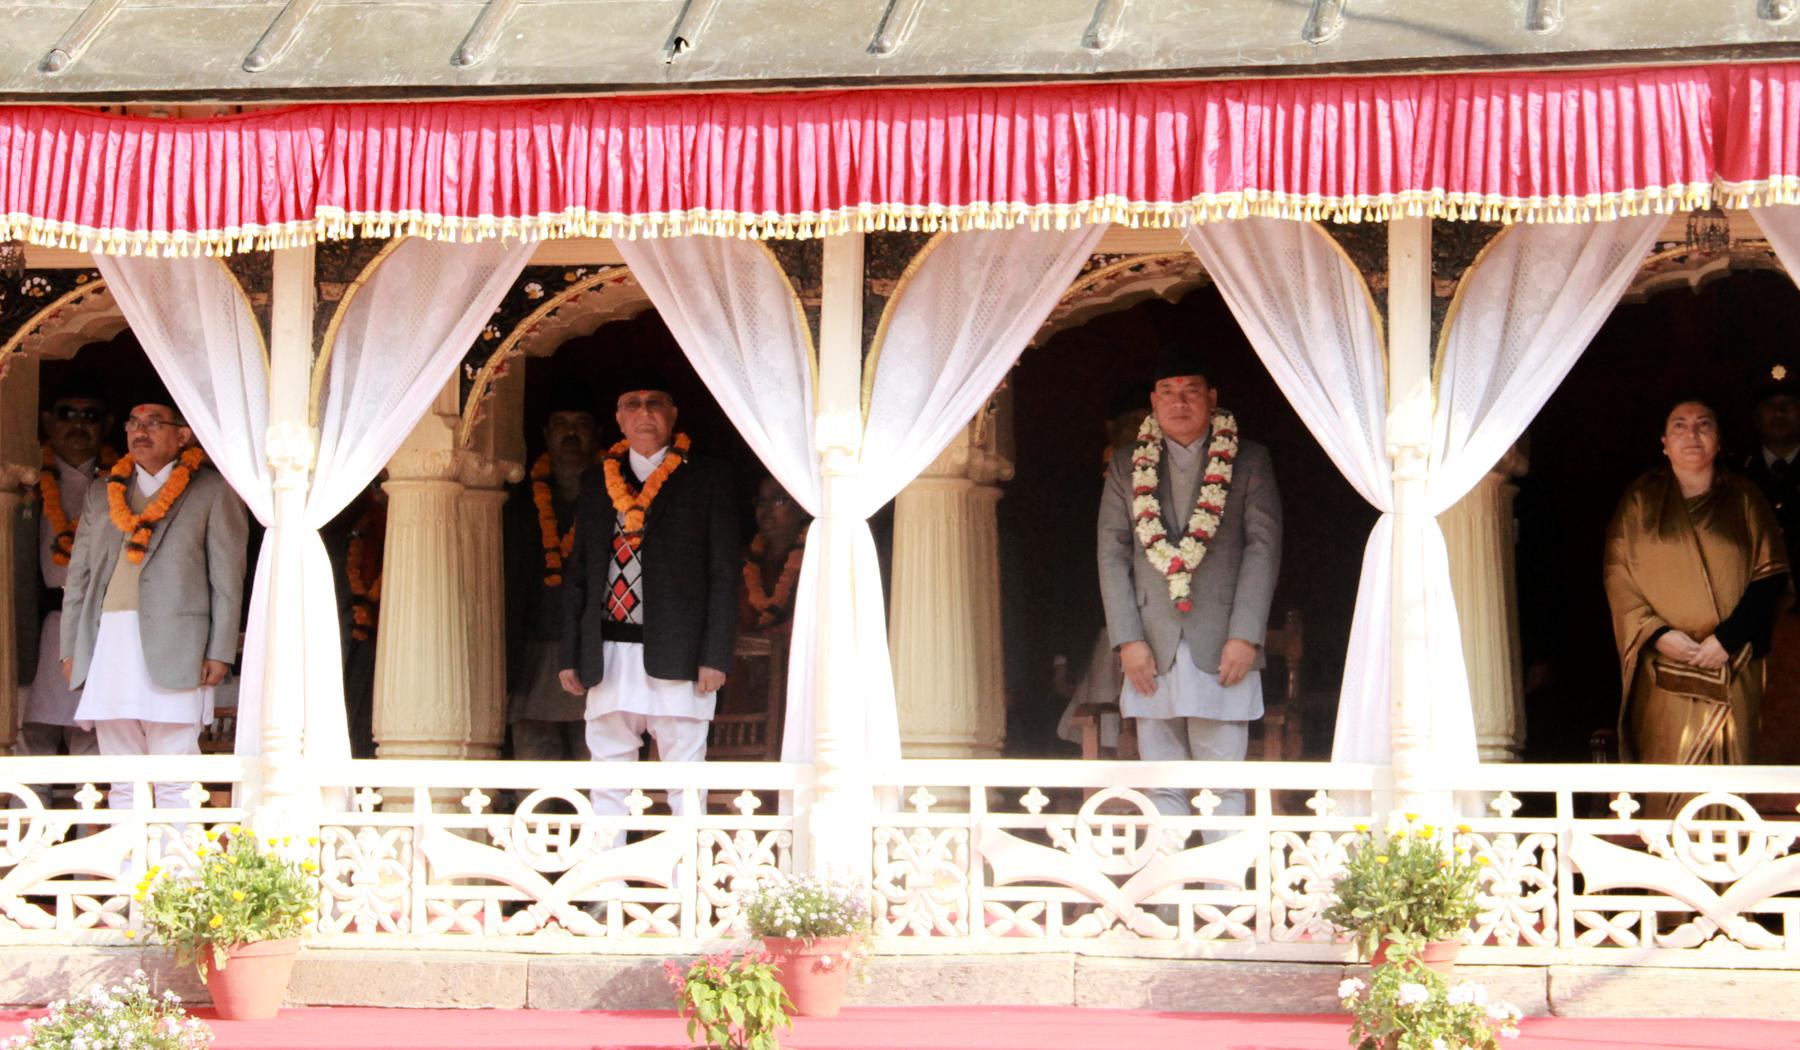 (From right) President Bidya Devi Bhandari, Vice-President Nanda Bahadur Pun, Prime Minister KP Sharma Oli and Chief Justice Kalyan Shrestha attending a programme organised on the occasion of Basanta Panchami at Hanumandhoka in the Capital on Saturday, February 13, 2016. Photo: RSS